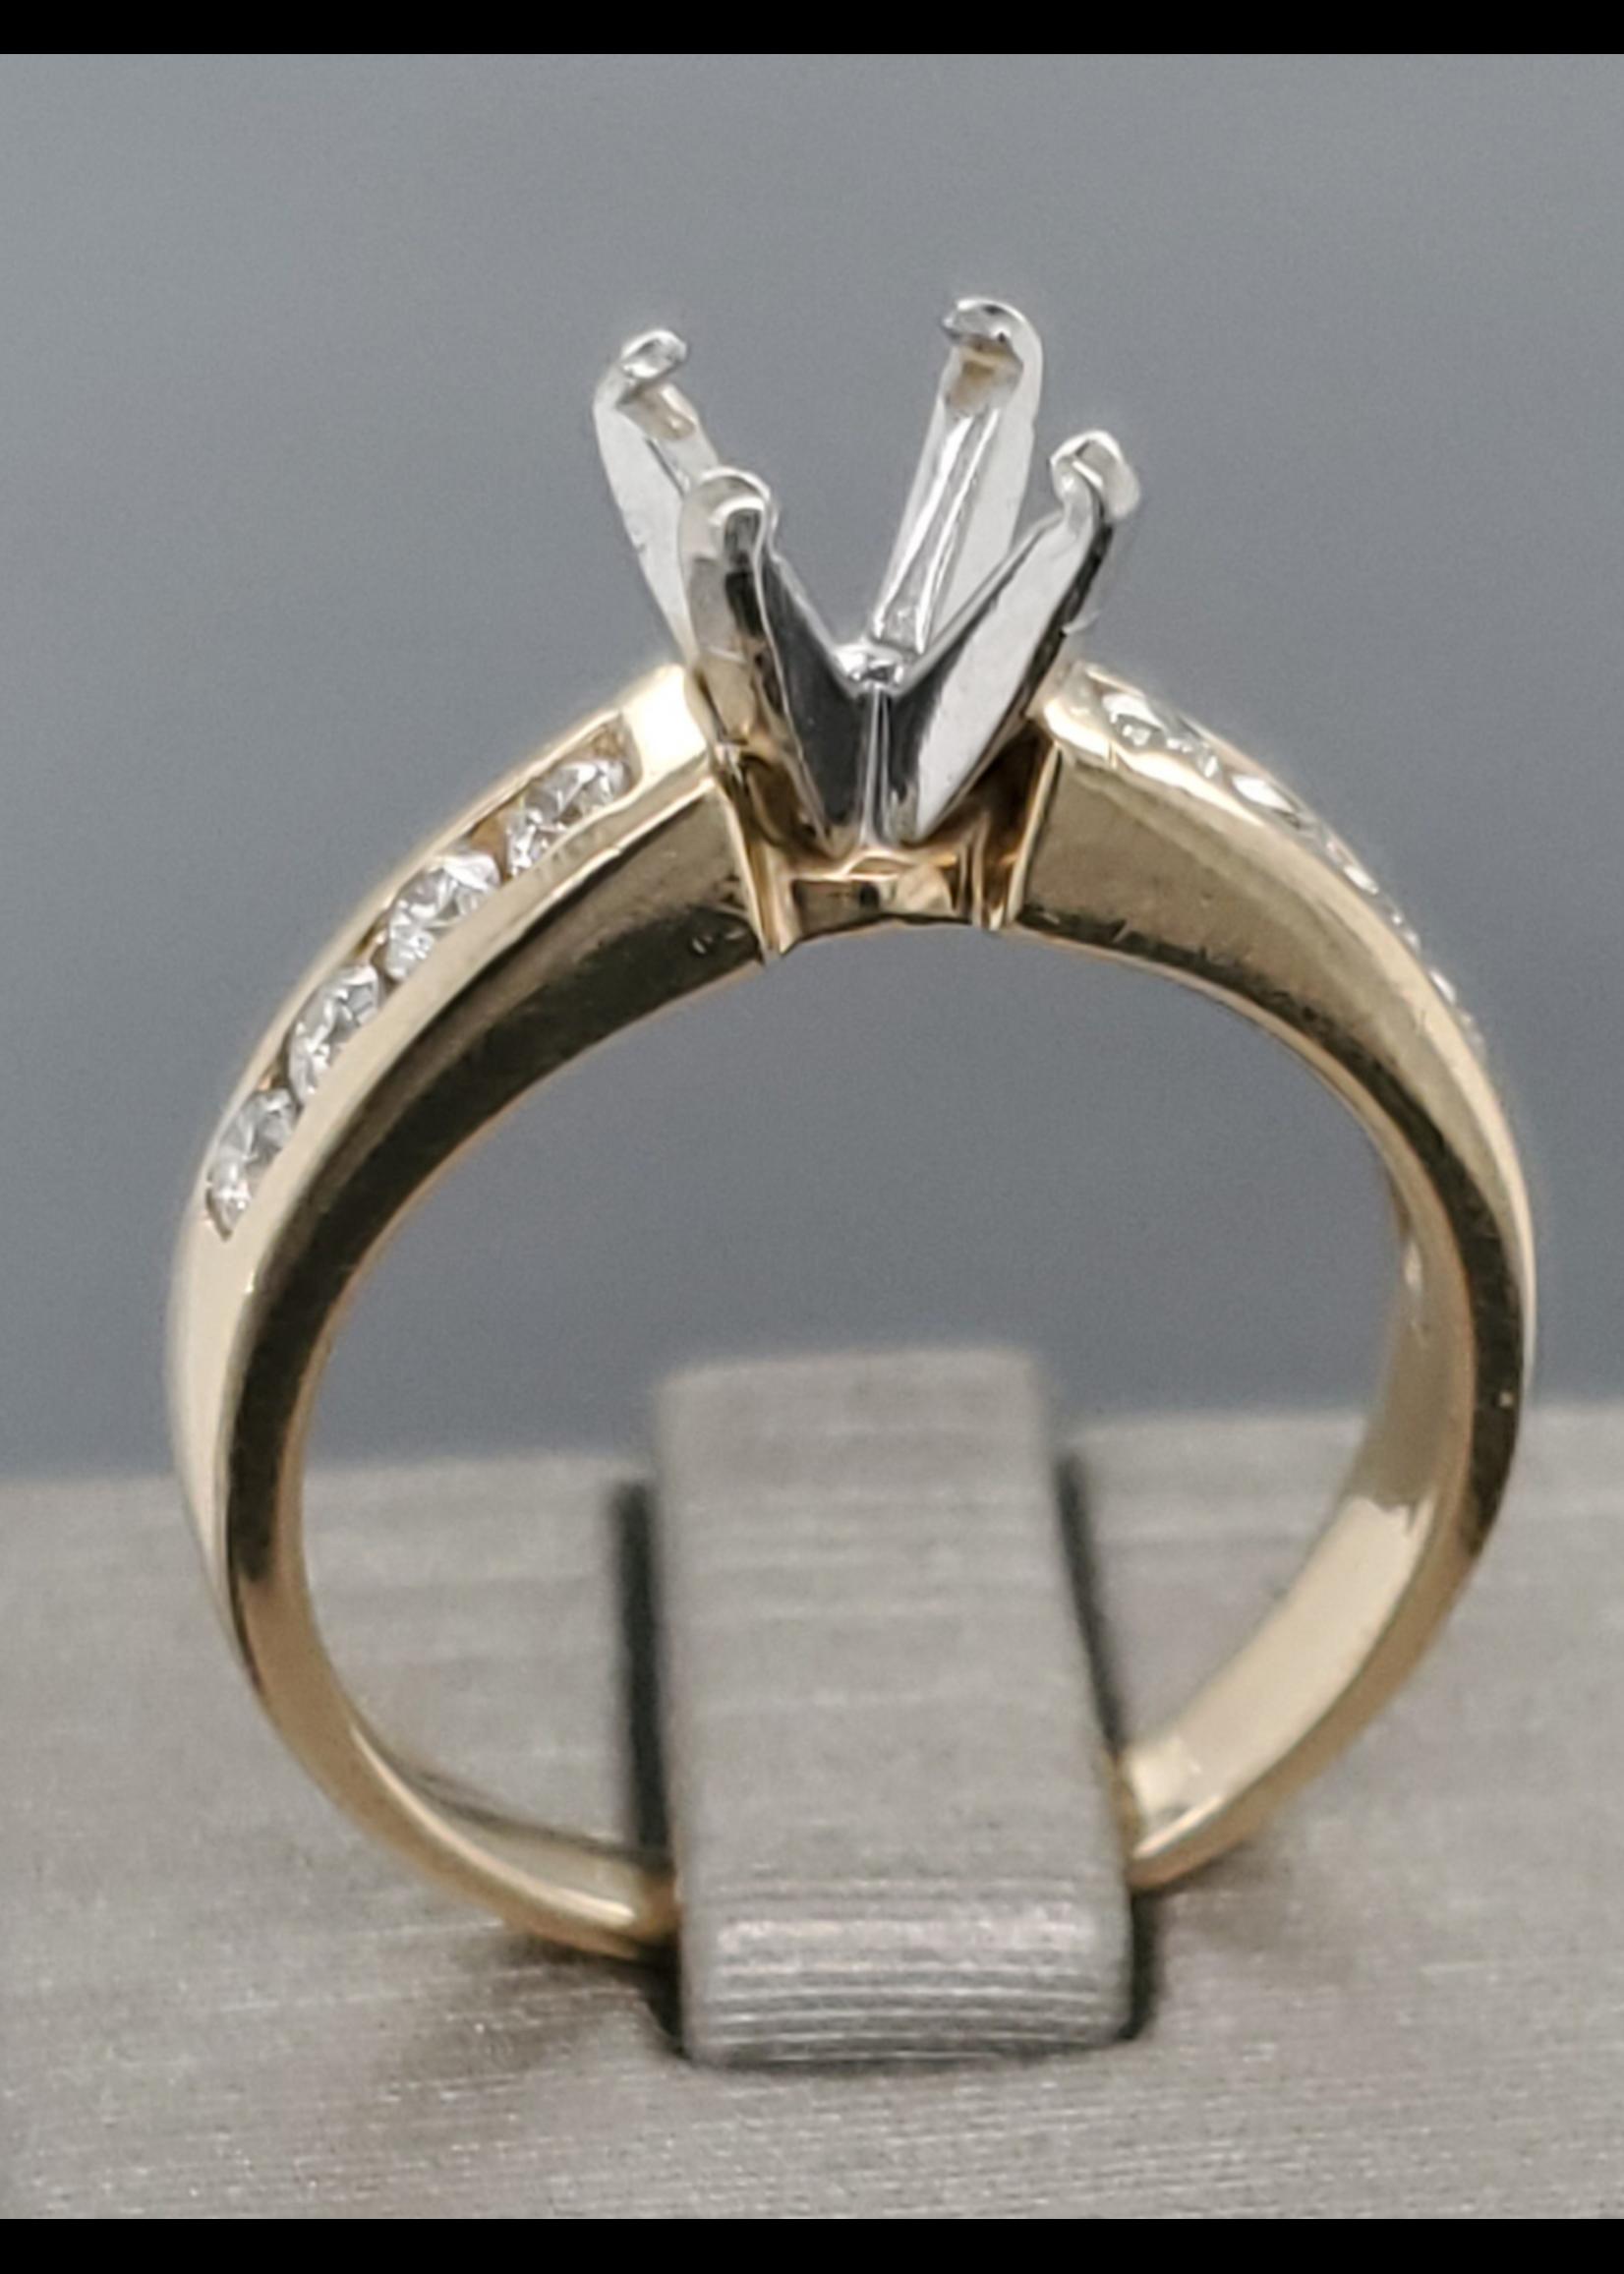 Vintage Jewellery Vintage 14k Solitaire Mount only | Sz 7 2.7mm